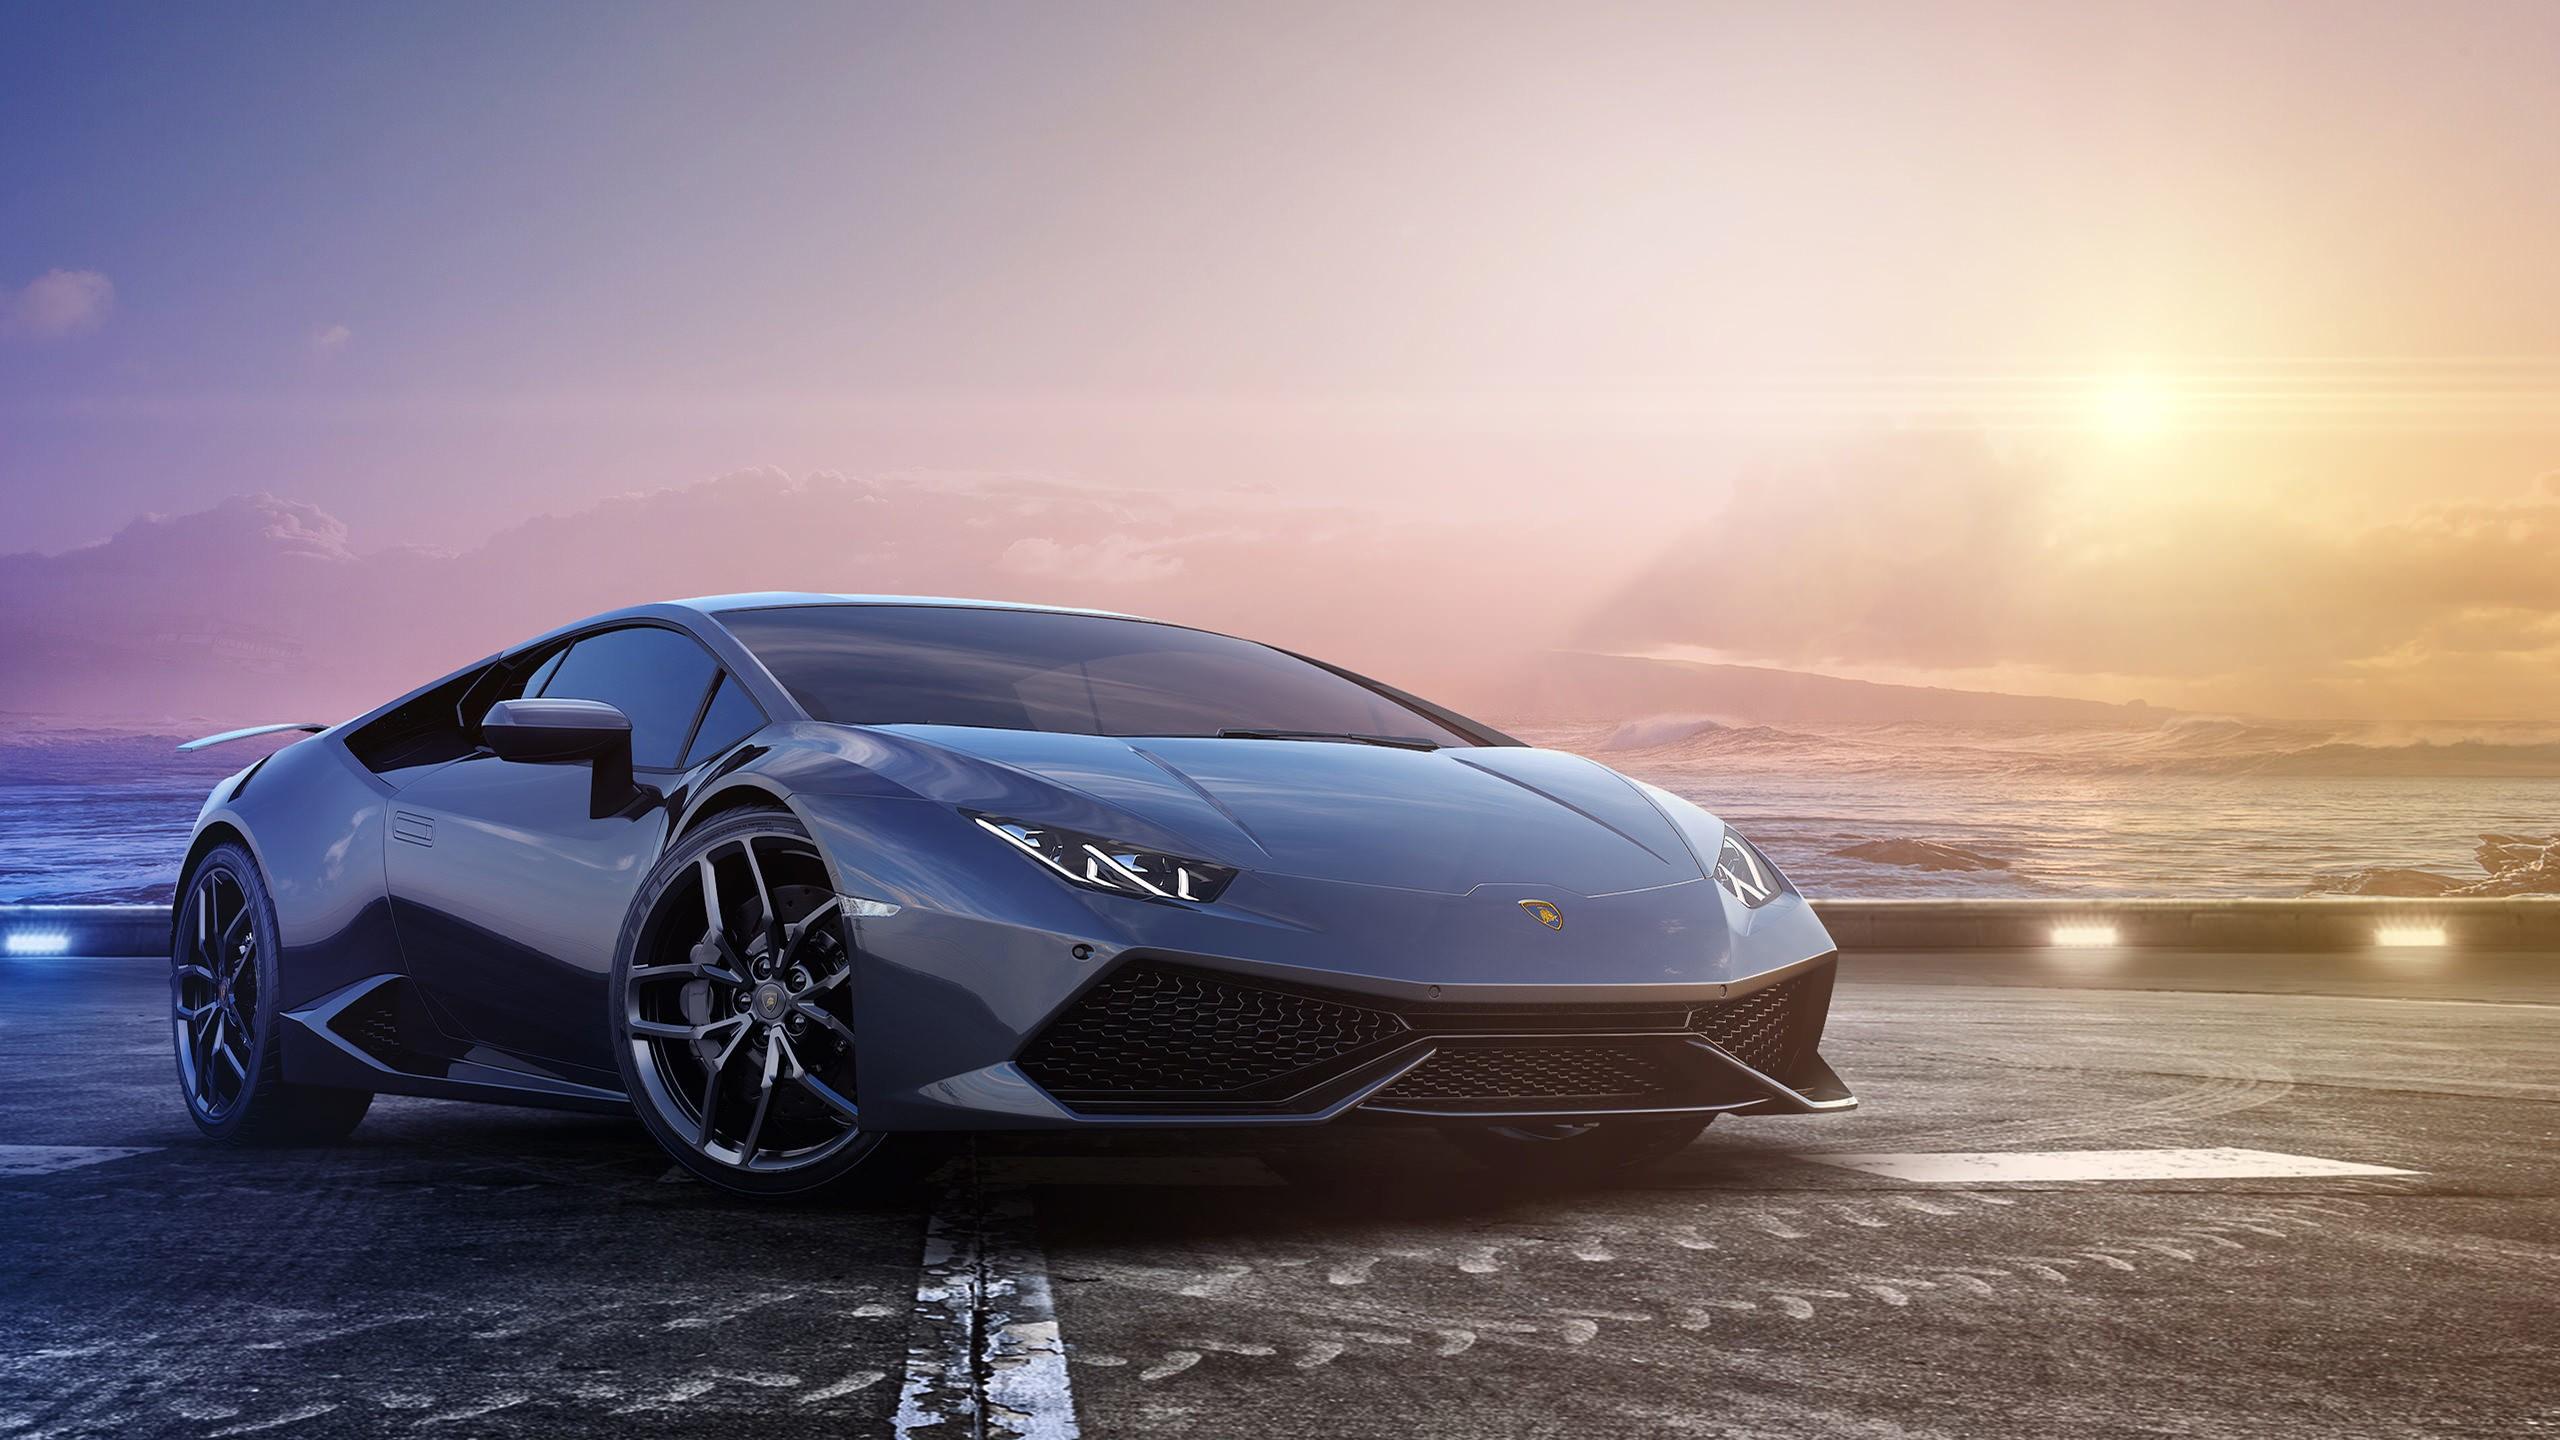 Download Romantic Love Quotes Wallpapers Lamborghini Wallpaper